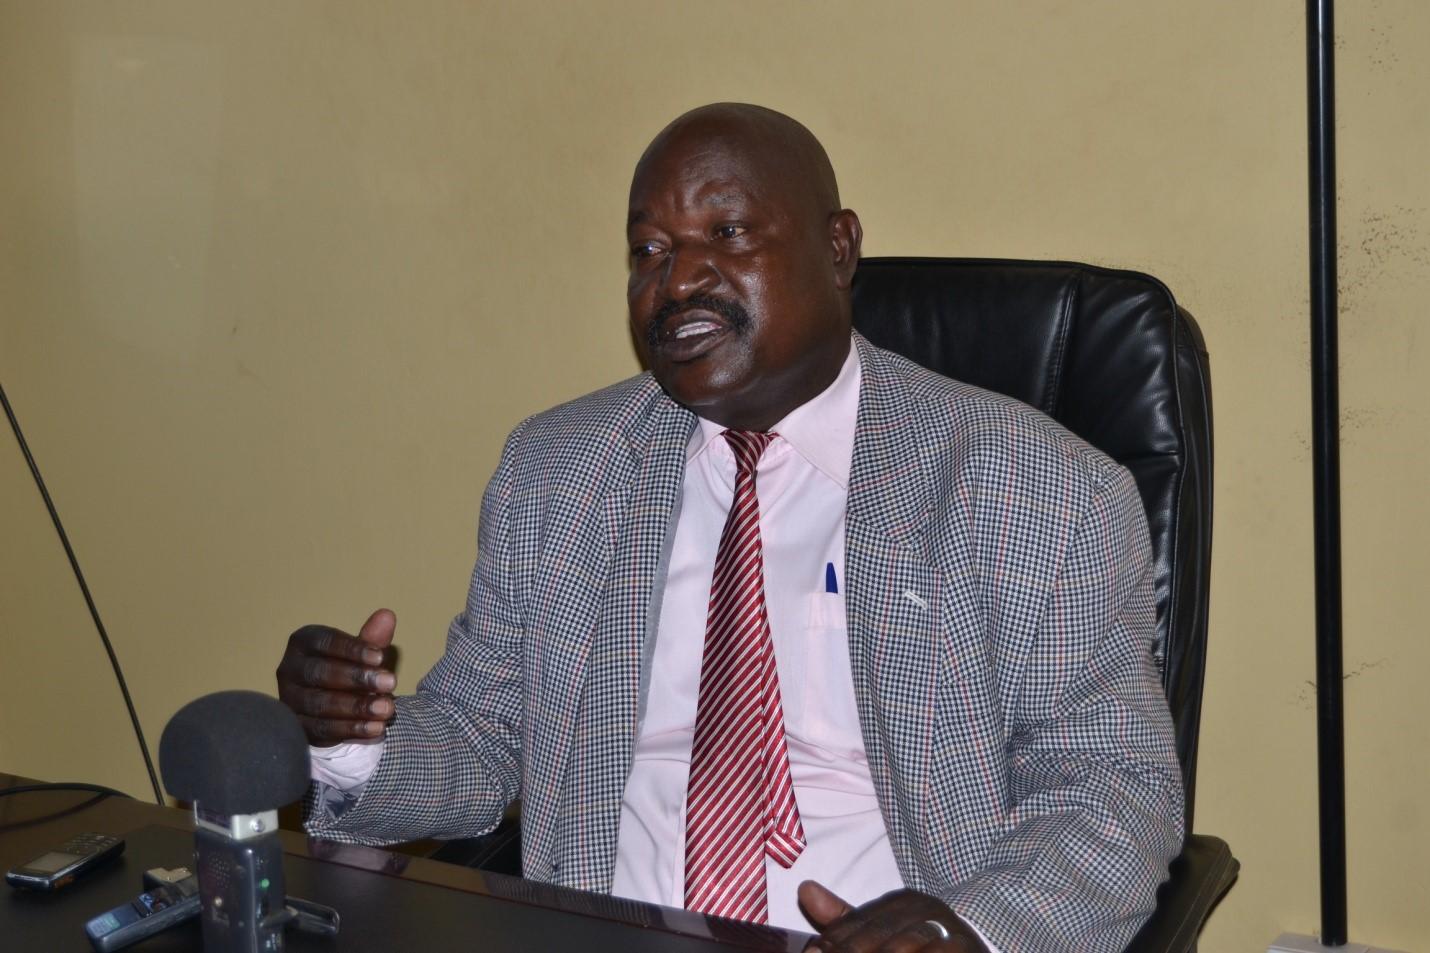 Dr. Sam Mutiti Tumwesige addressing the media